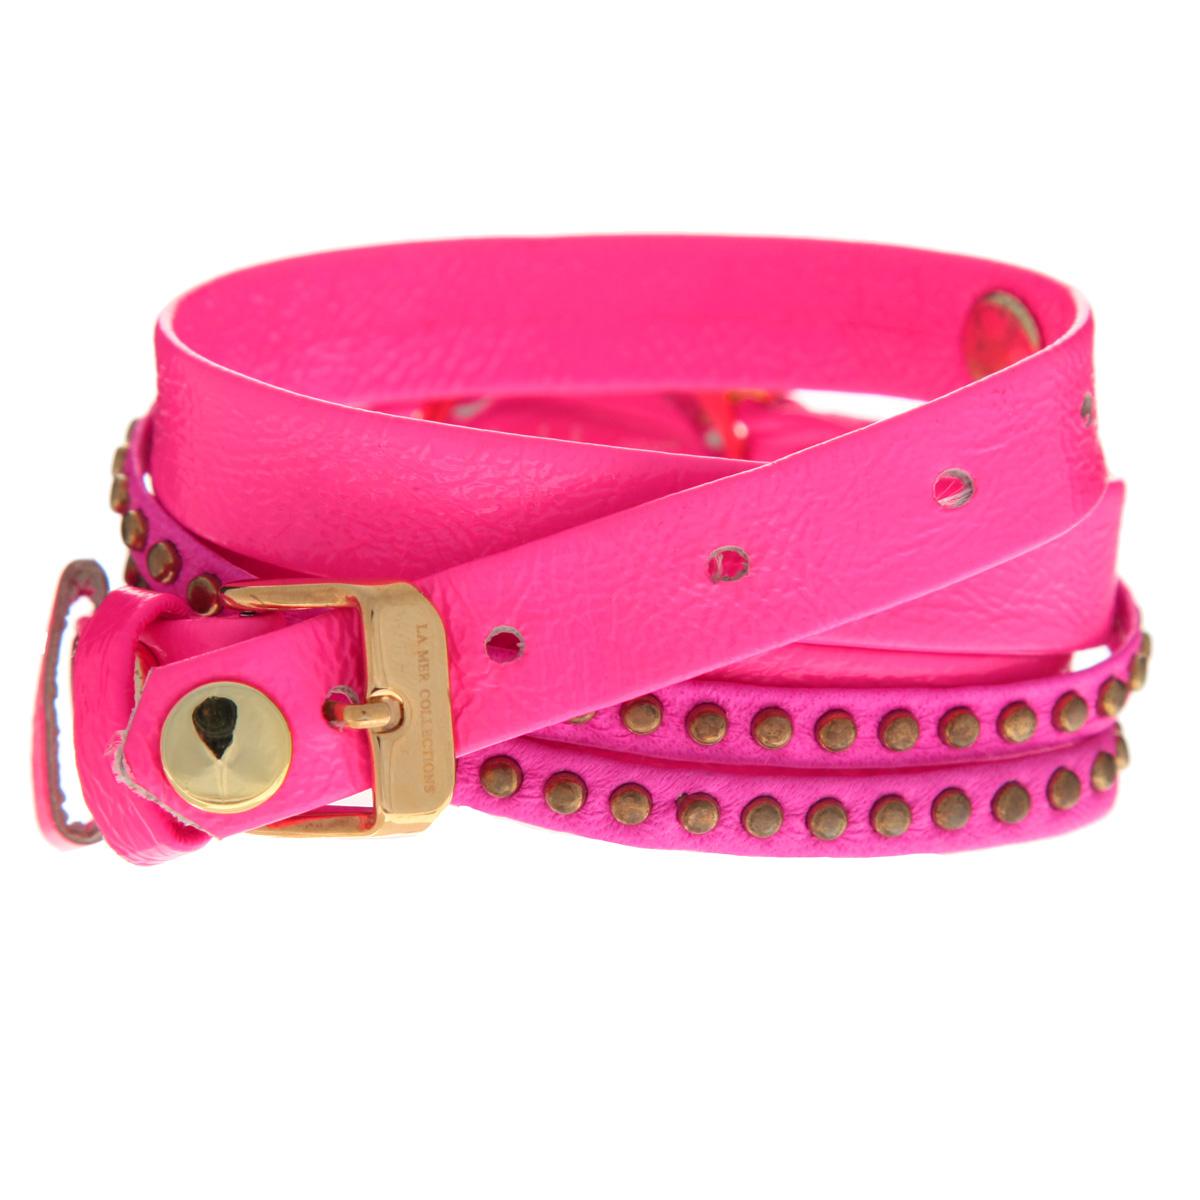 "Часы наручные женские La Mer Collections ""Bali Neon Pink"". LMSW4000 ( LMSW4000 )"